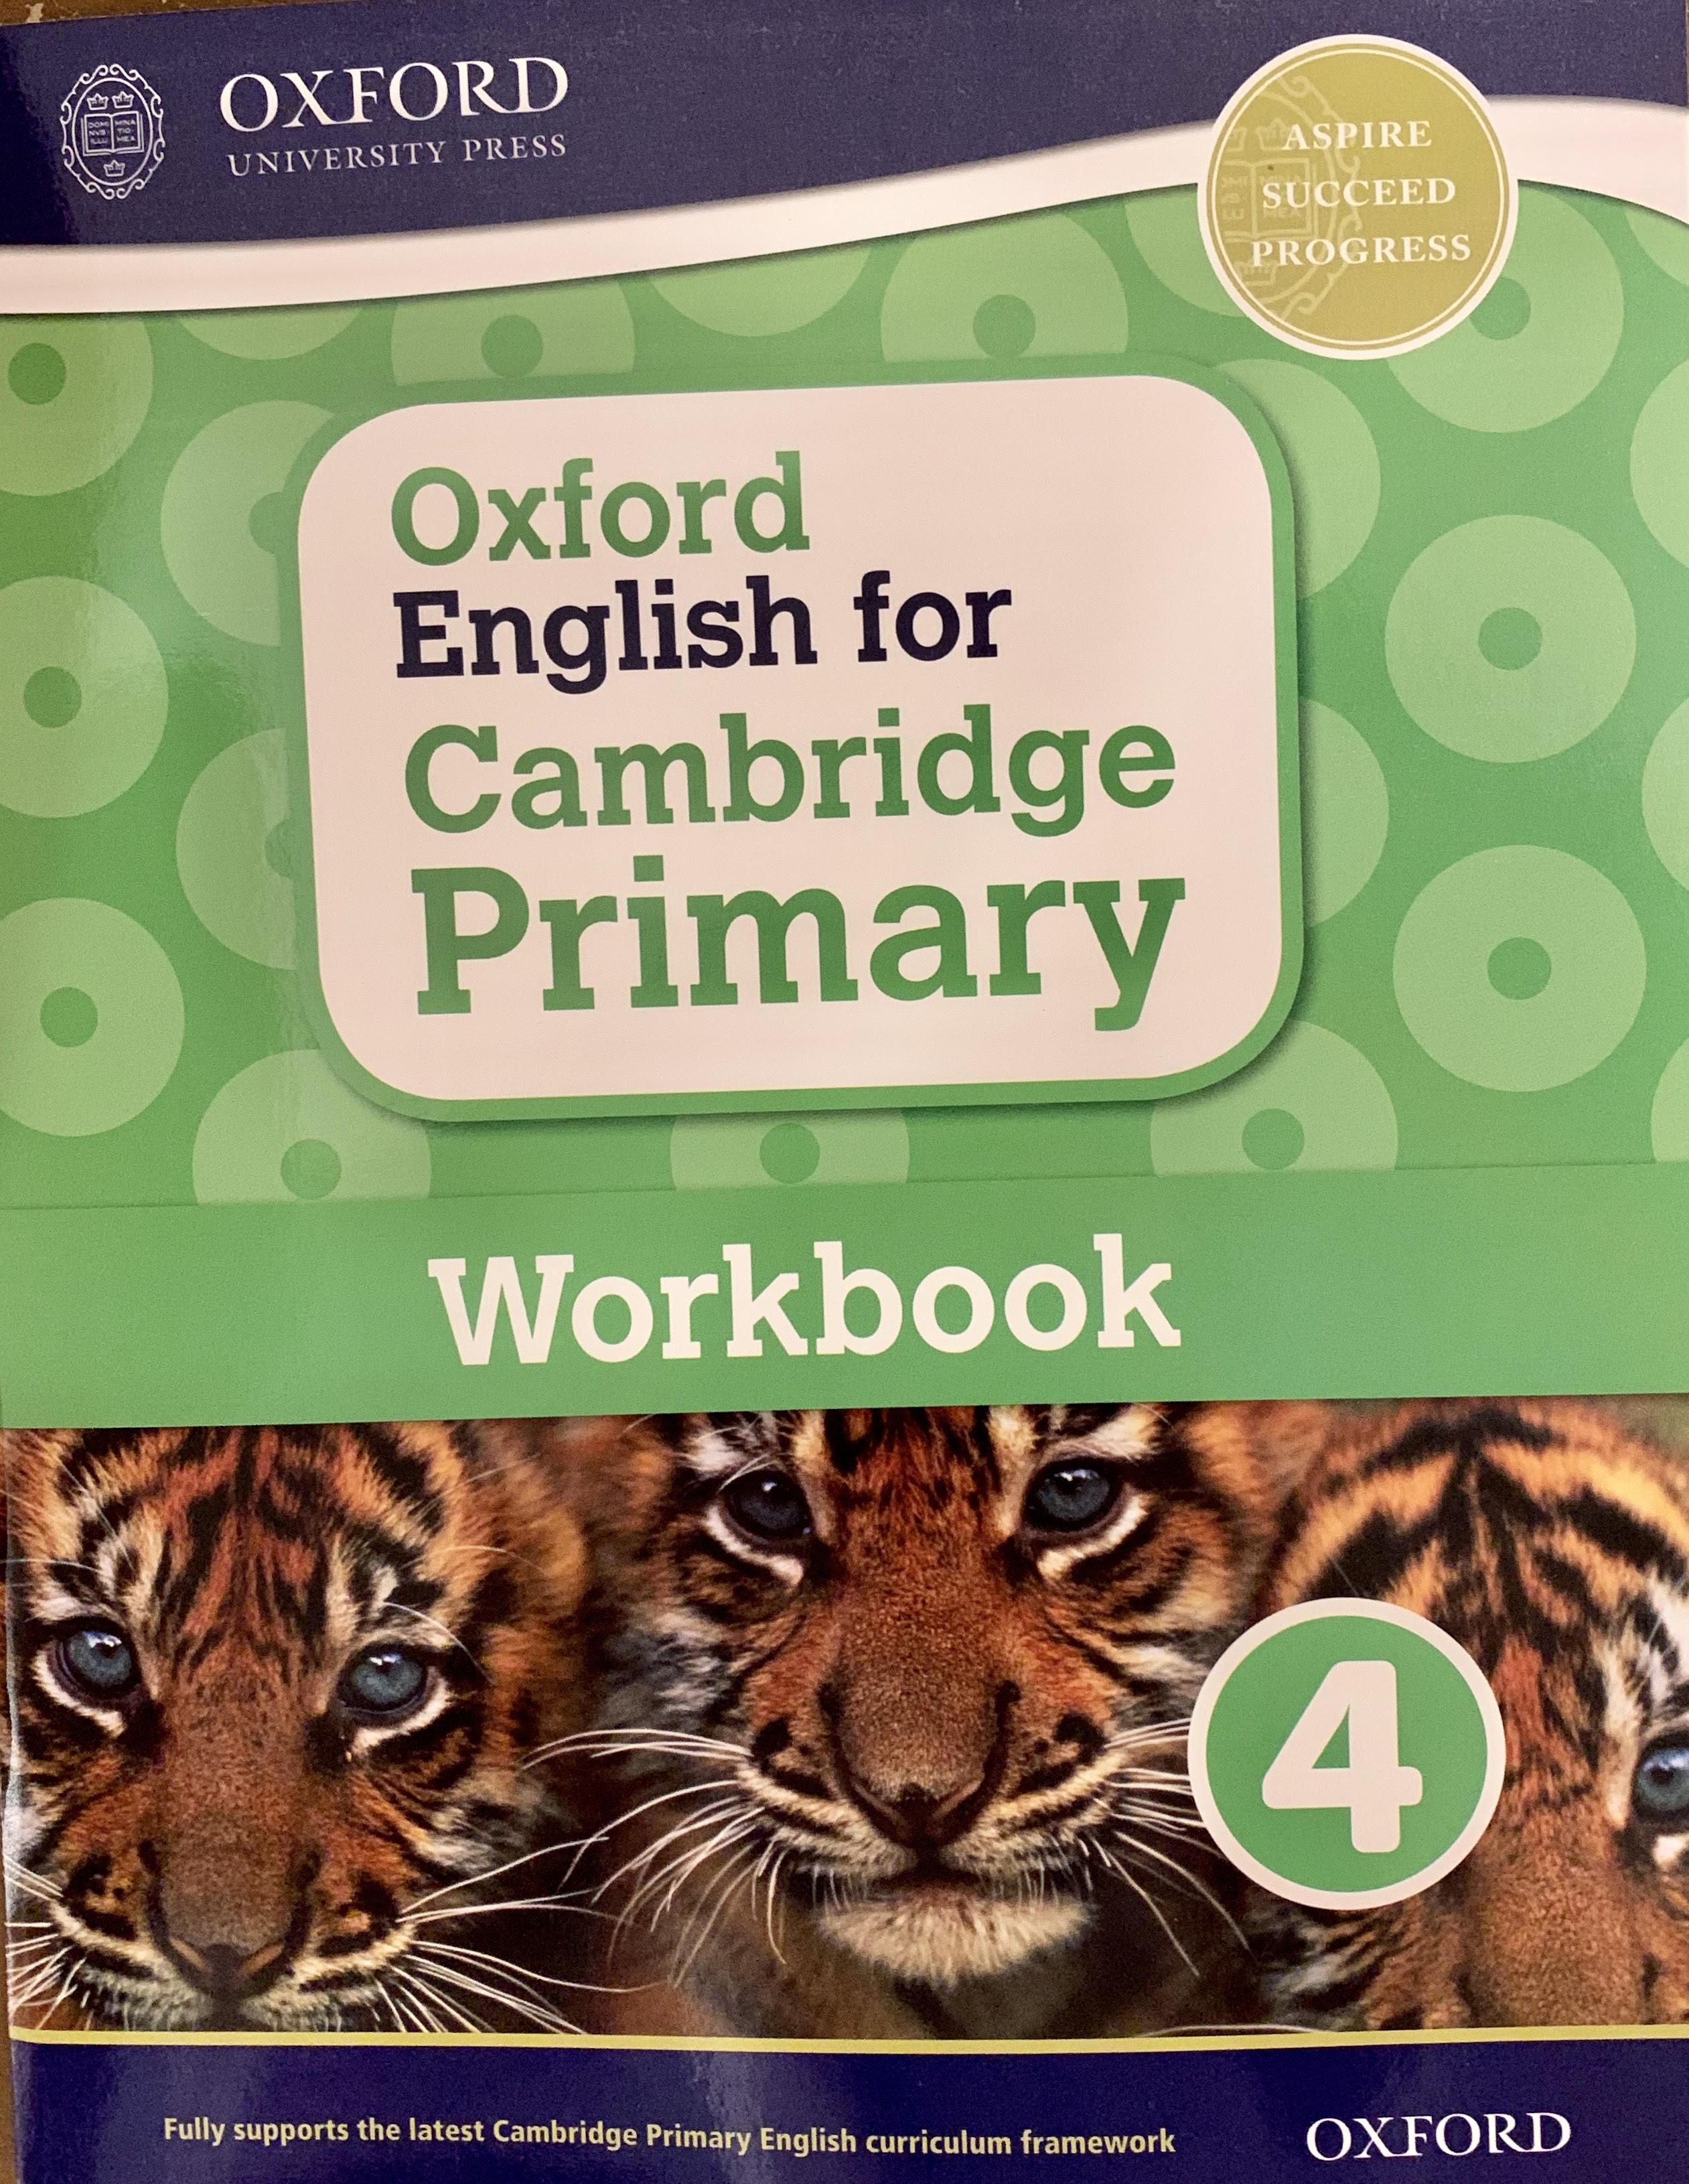 Oxford English for Cambridge Primary Work 4